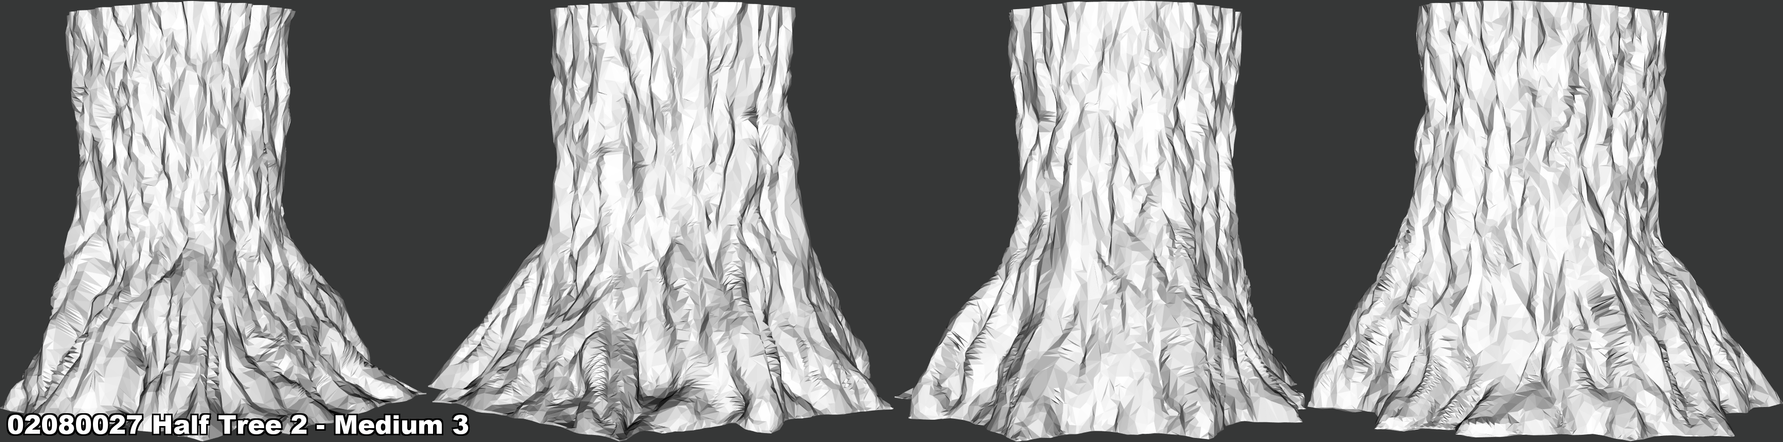 02080027 Half Tree 2 - Medium 3.png